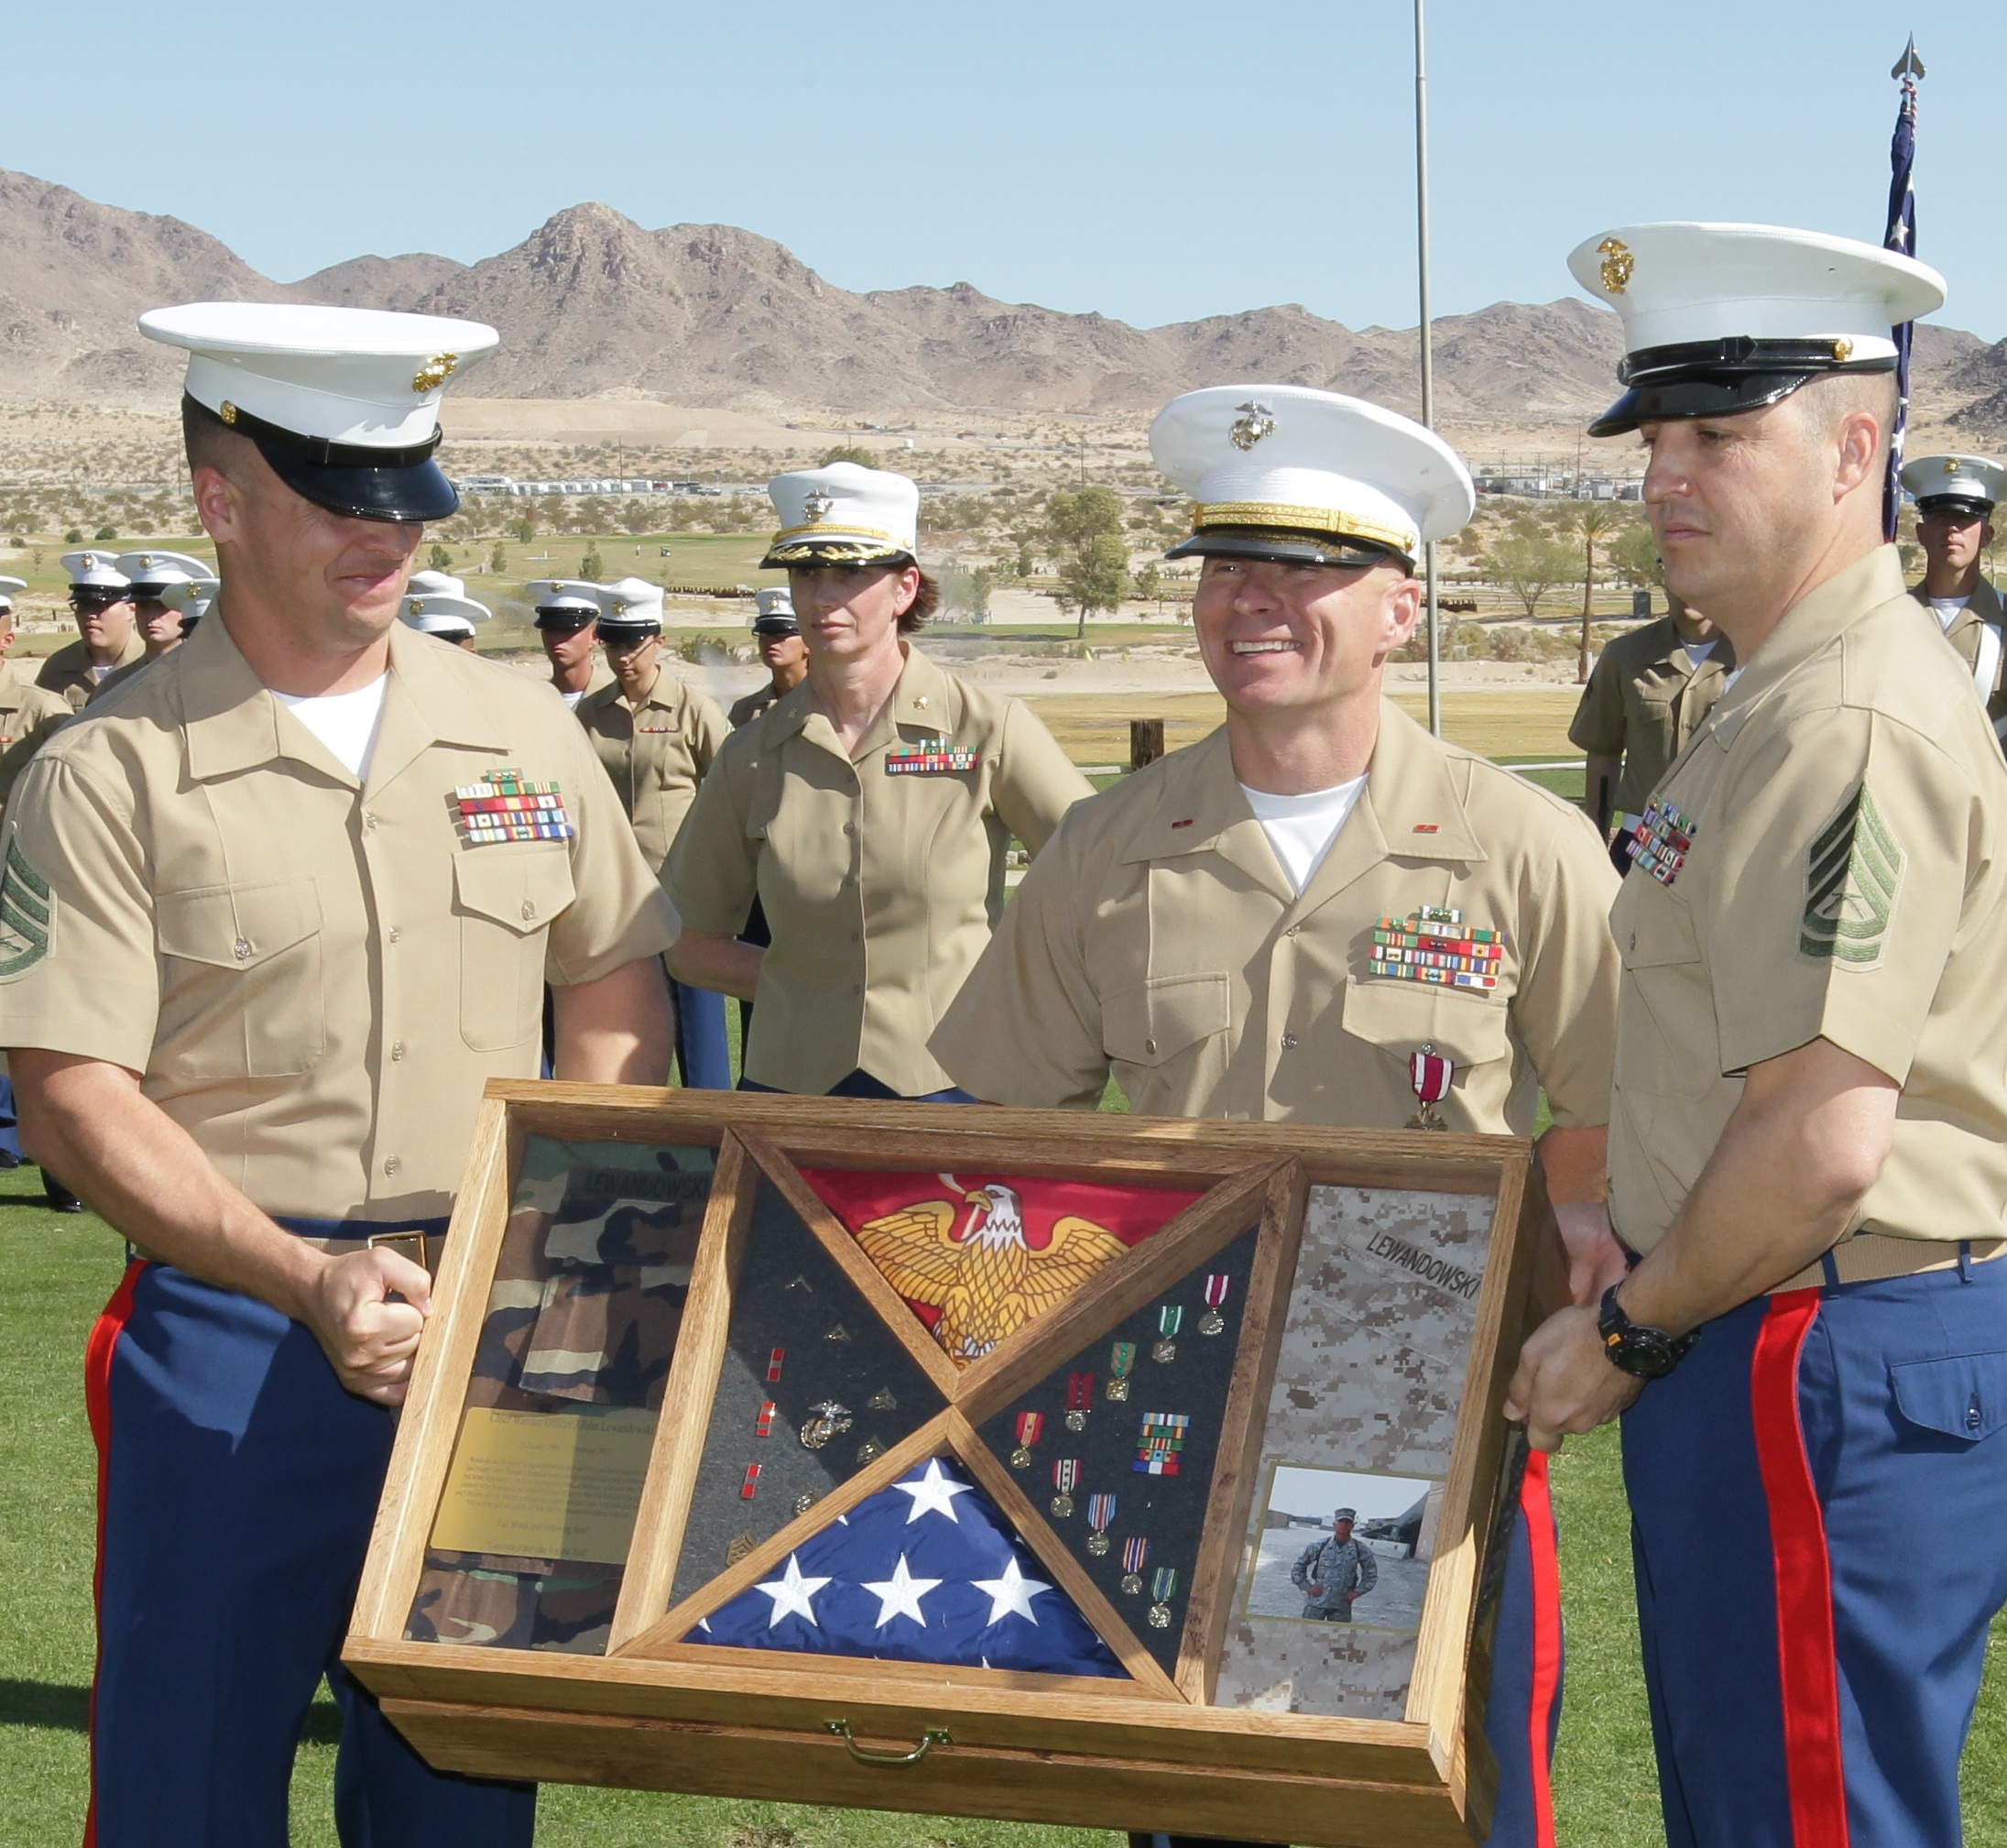 John posing with his fellow Marines.